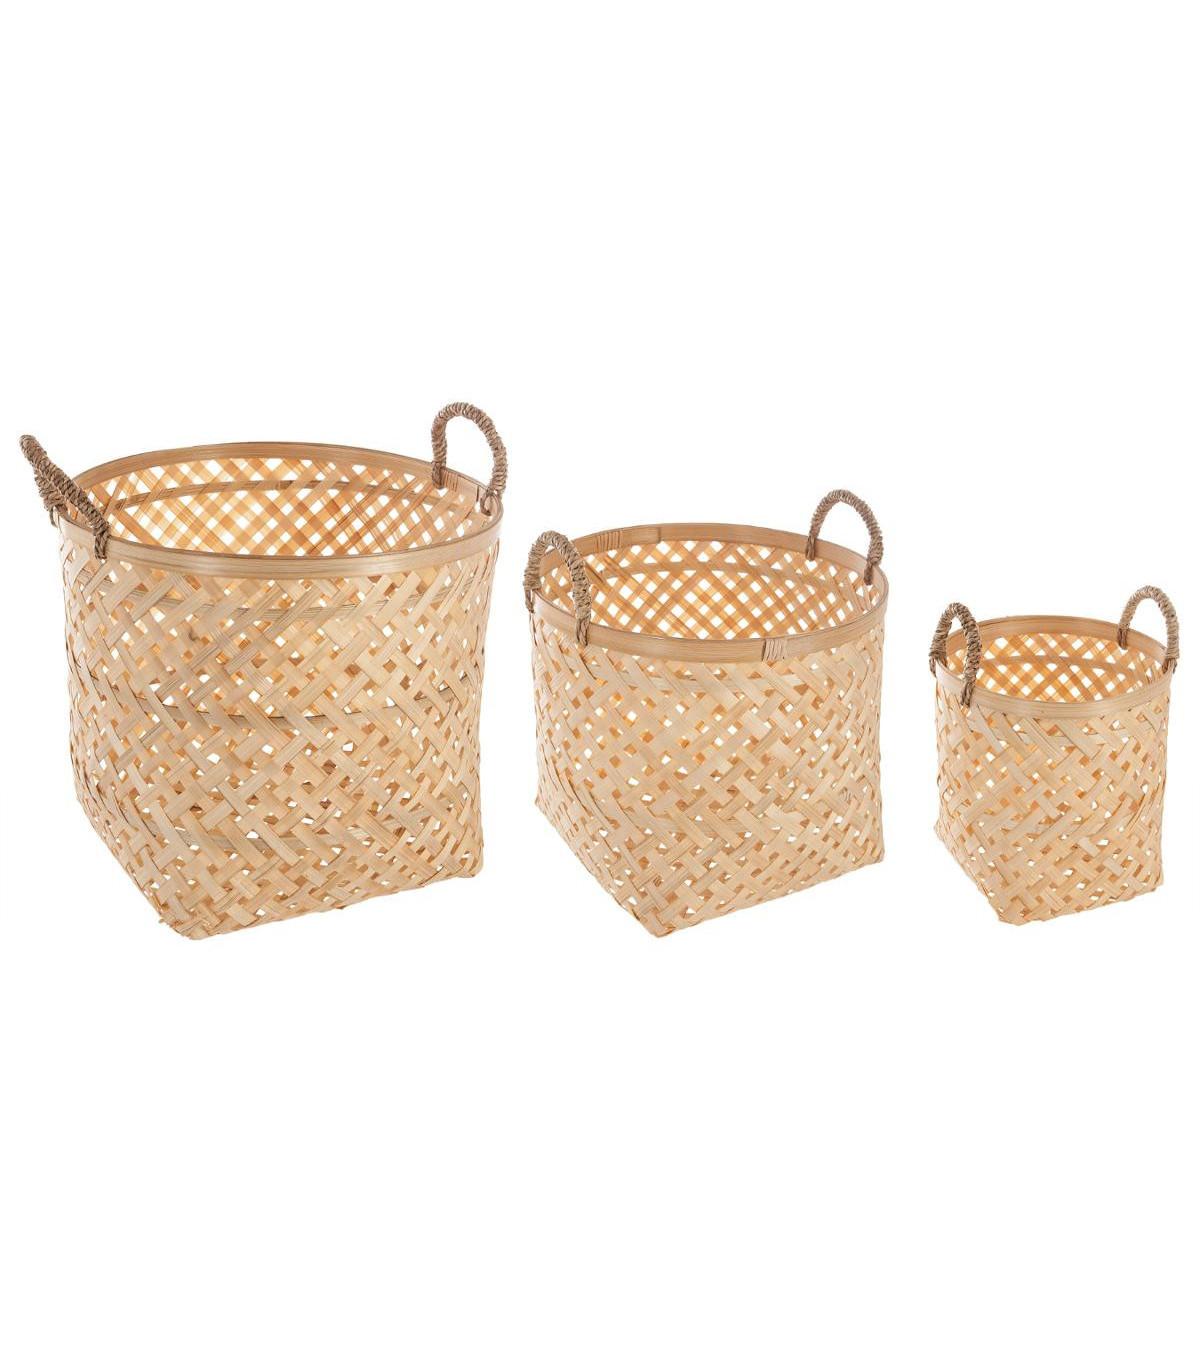 Atmosphera Lot de 3 Paniers avec couvercles en Bambou Blanchi